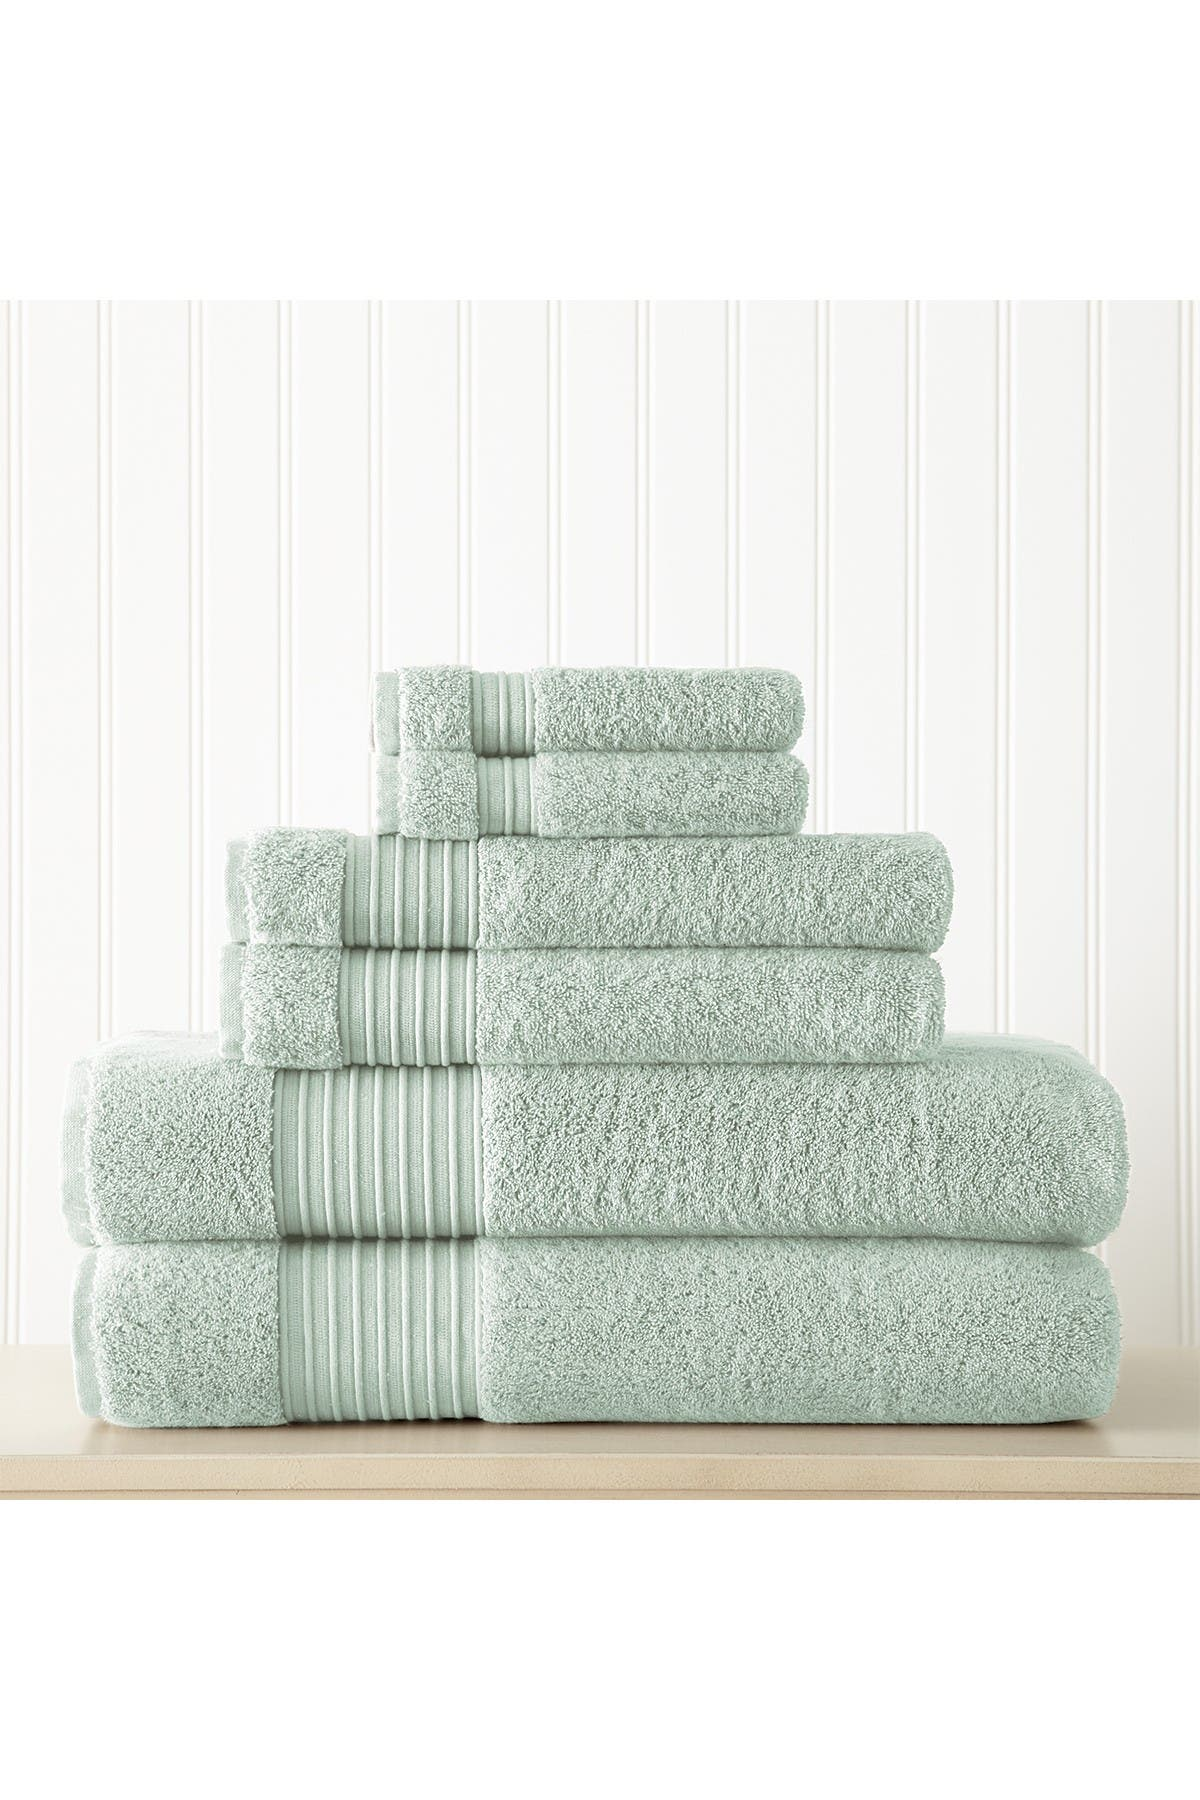 Image of Modern Threads 6-Piece Turkish Cotton Towel Set - Aqua